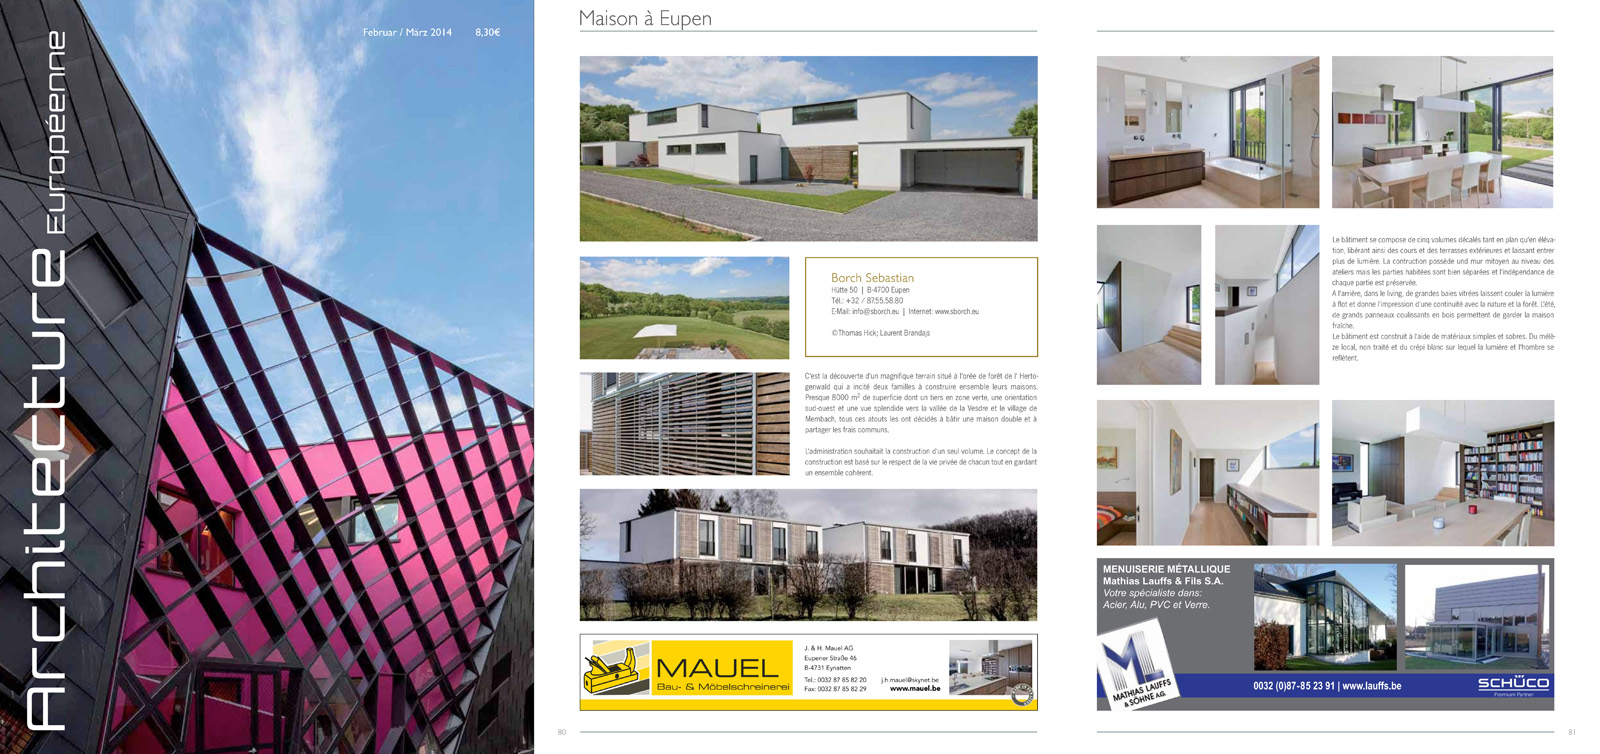 ARCHITECTURE EUROPEENE - 02/2014